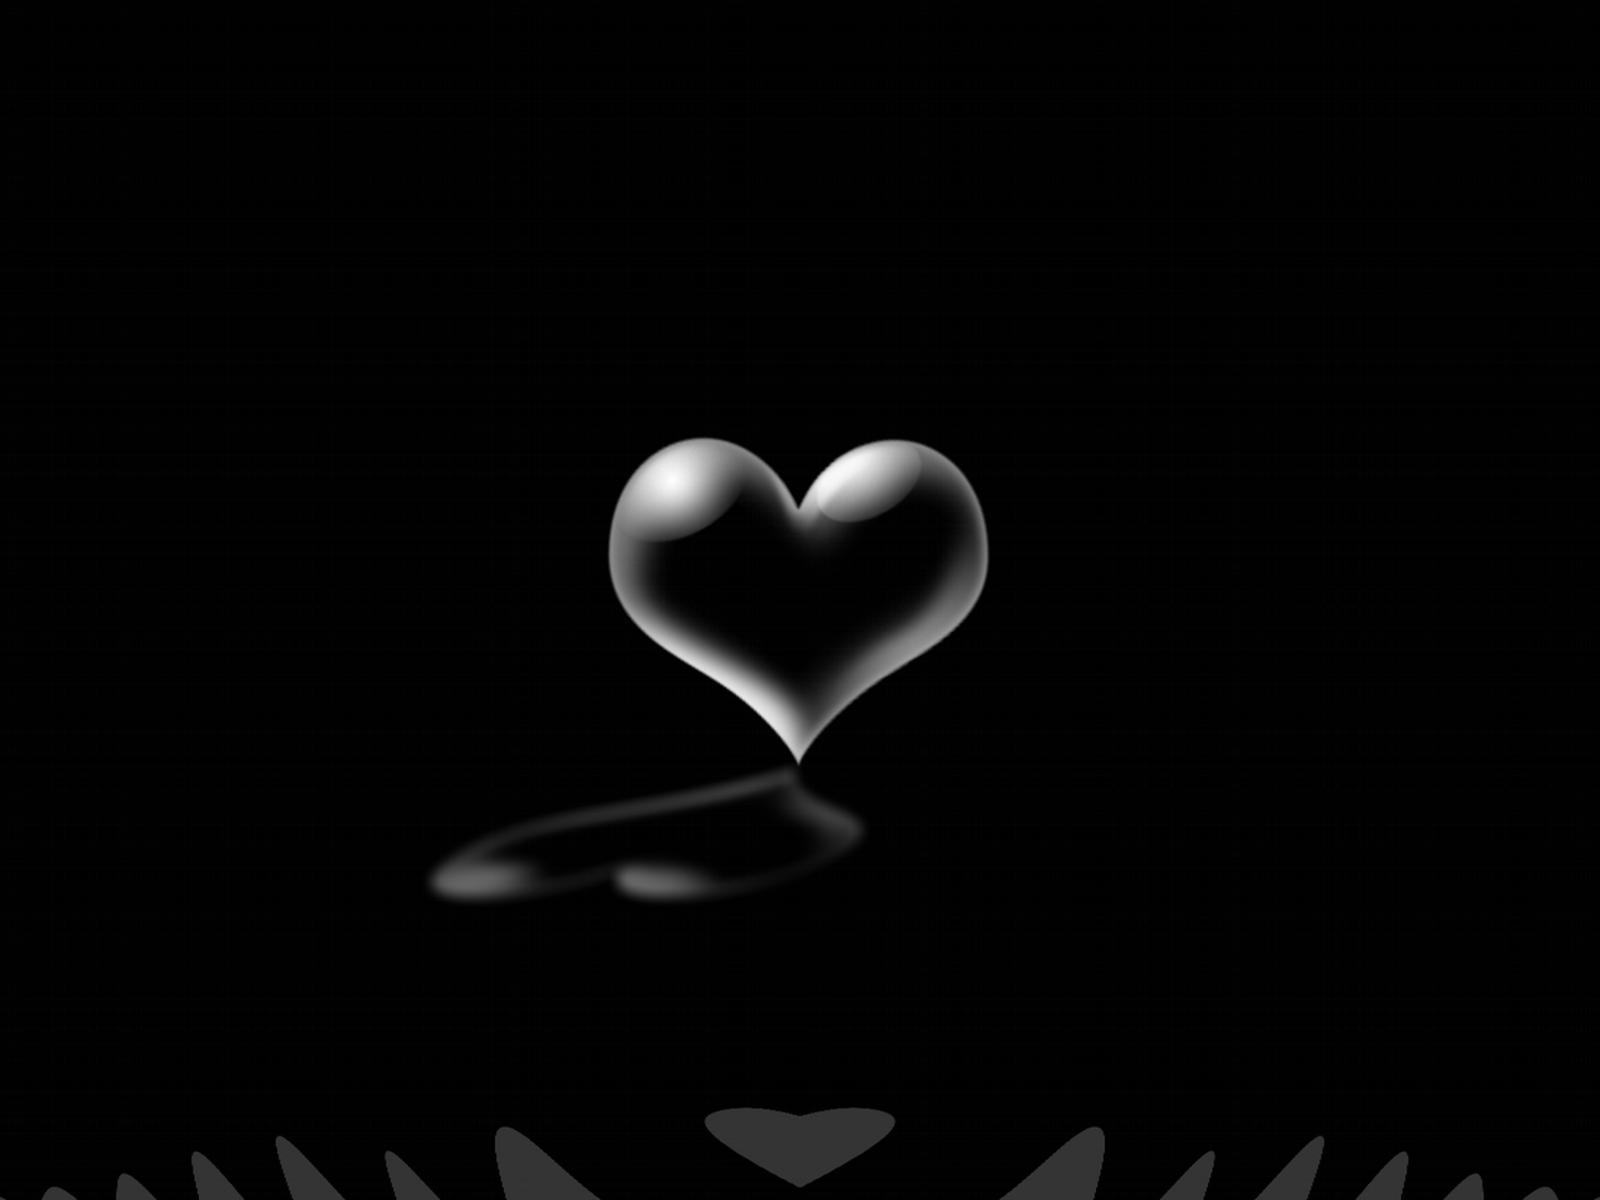 Black And White Heart Background Wallpapersafari